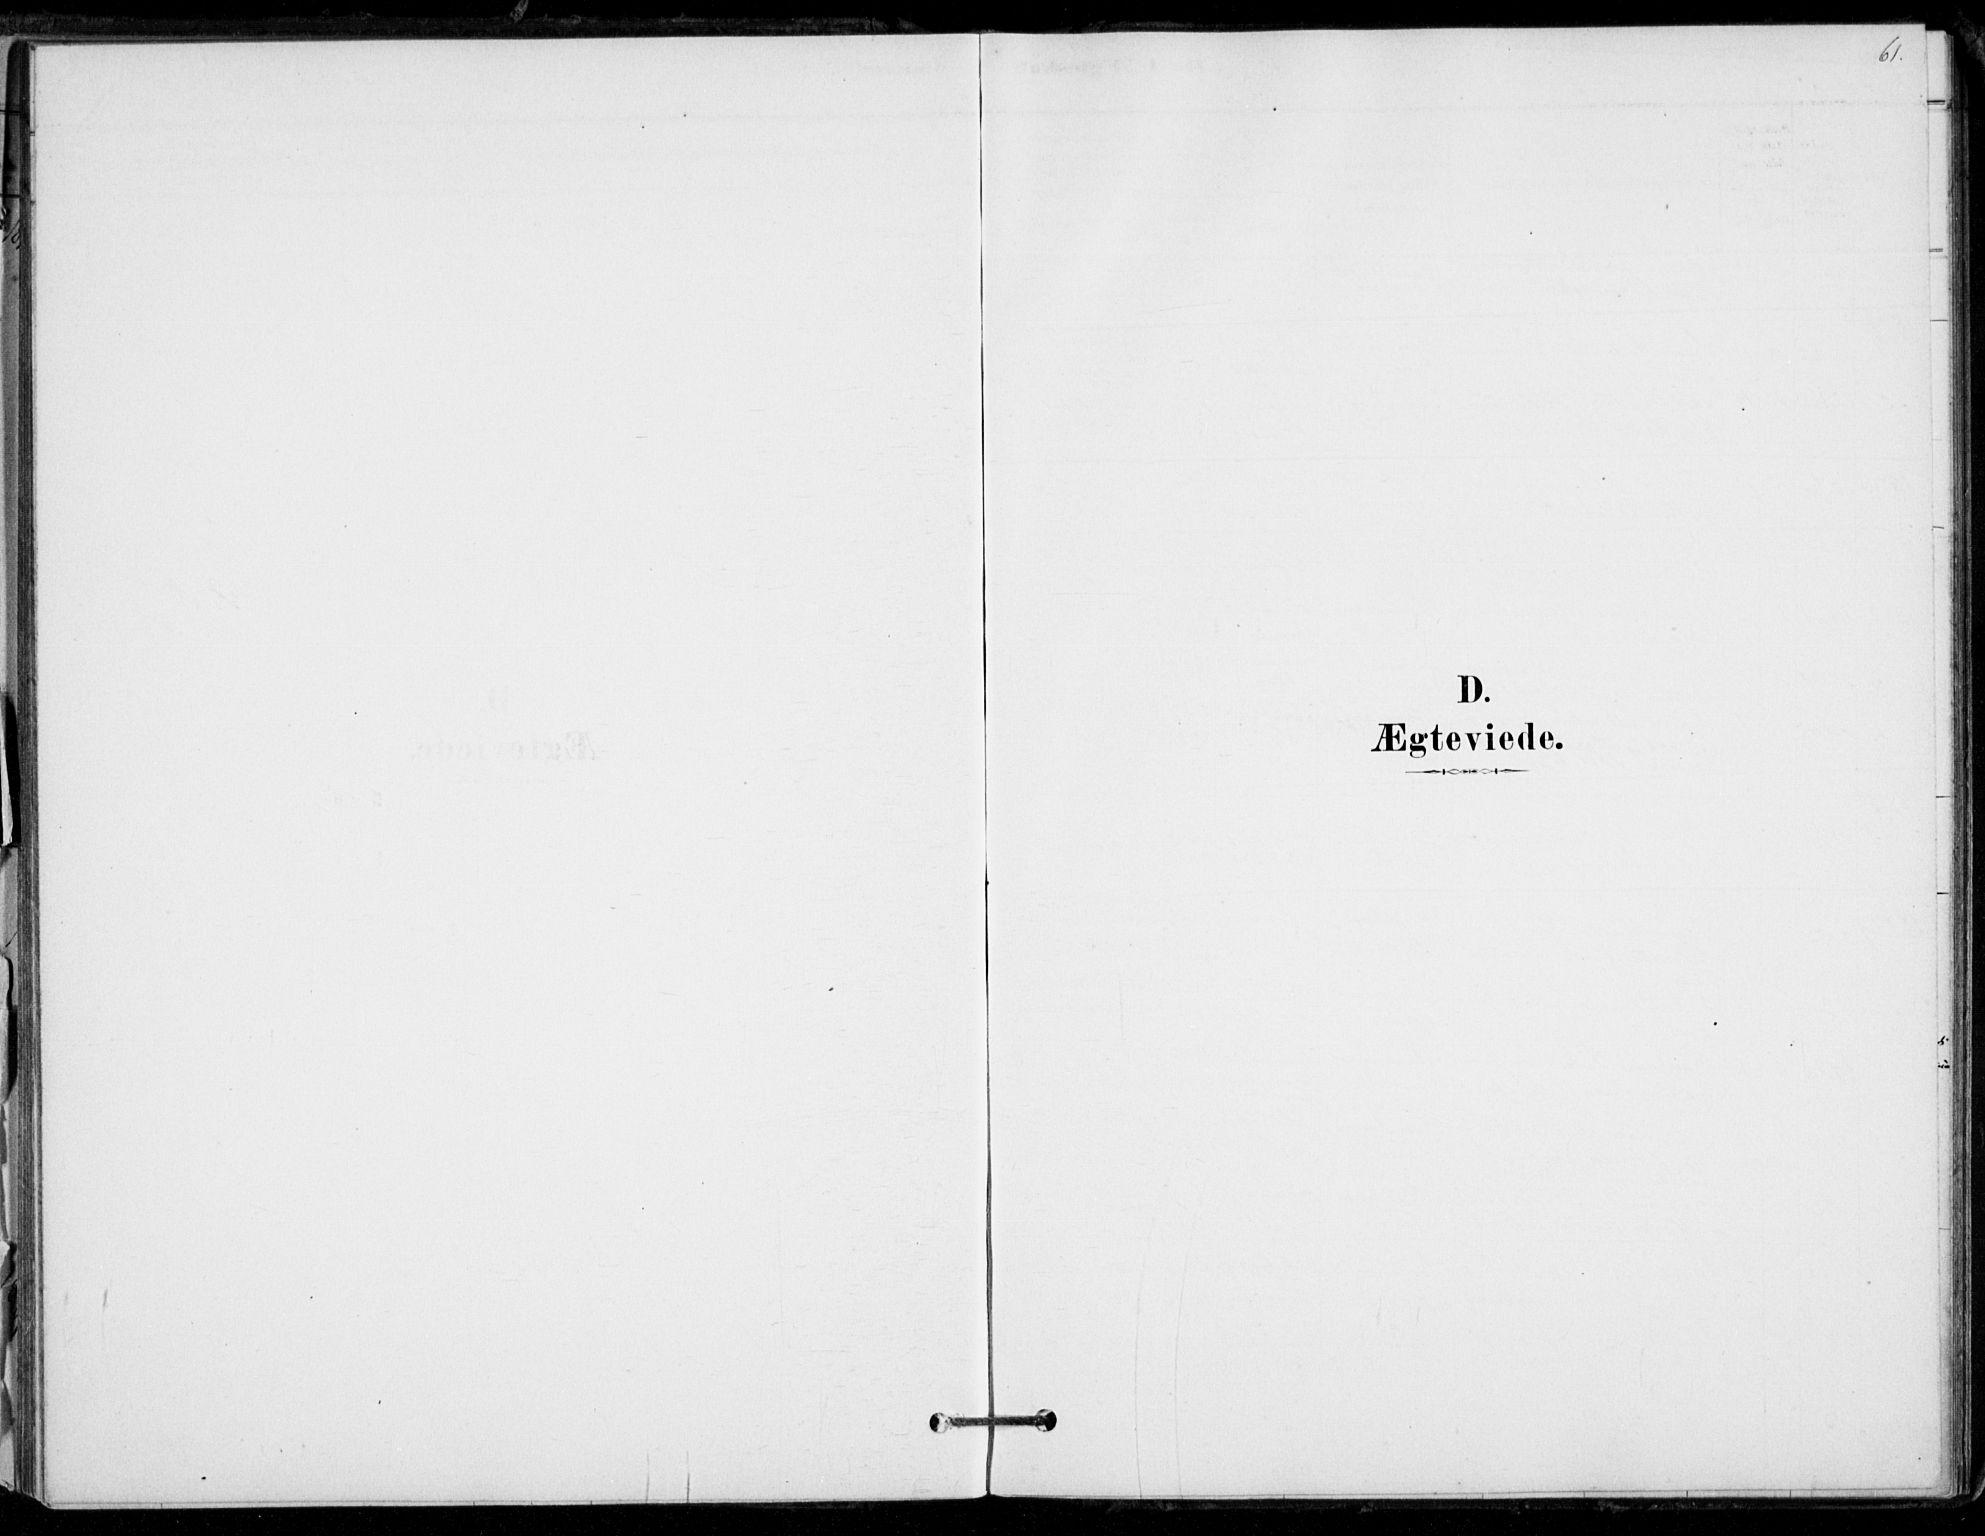 SAKO, Hof kirkebøker, F/Fb/L0001: Ministerialbok nr. II 1, 1878-1907, s. 61